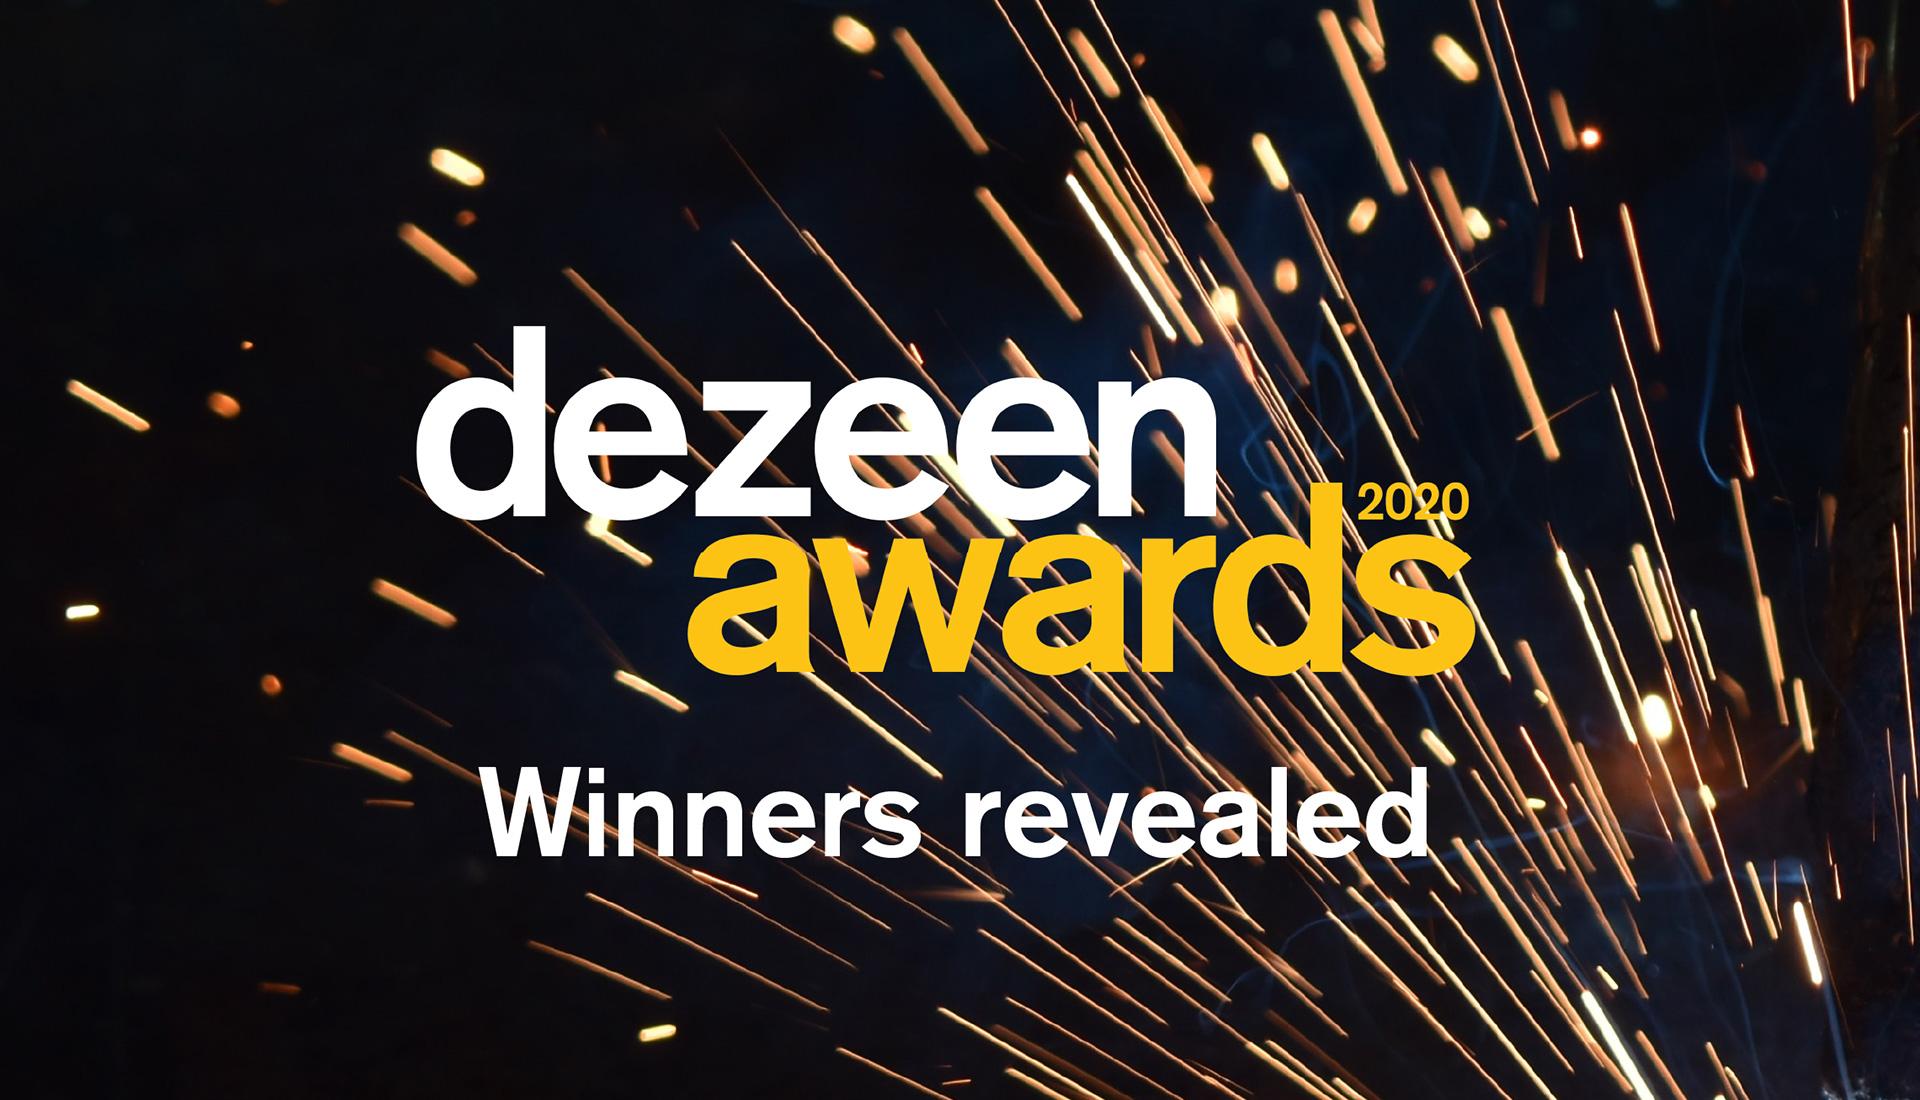 DEZEEN AWARDS 2020 фото